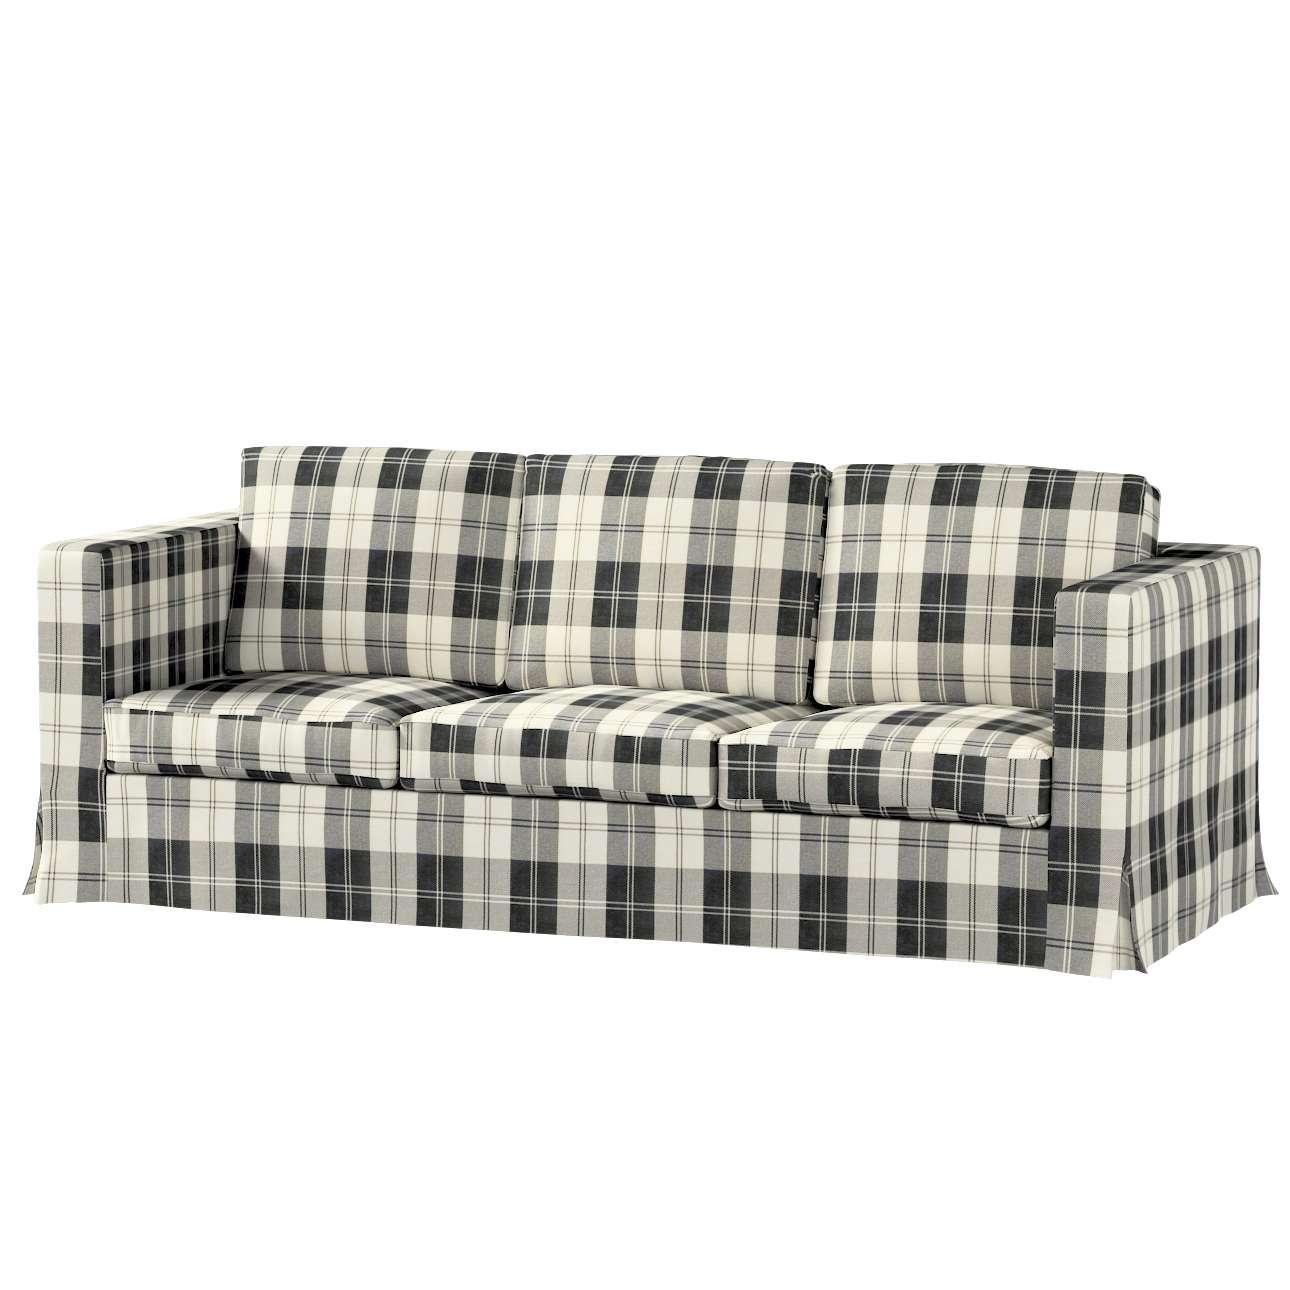 Karlanda 3-Sitzer  Sofabezug nicht ausklappbar lang Sofa Karlanda 3-lang von der Kollektion Edinburgh , Stoff: 115-74